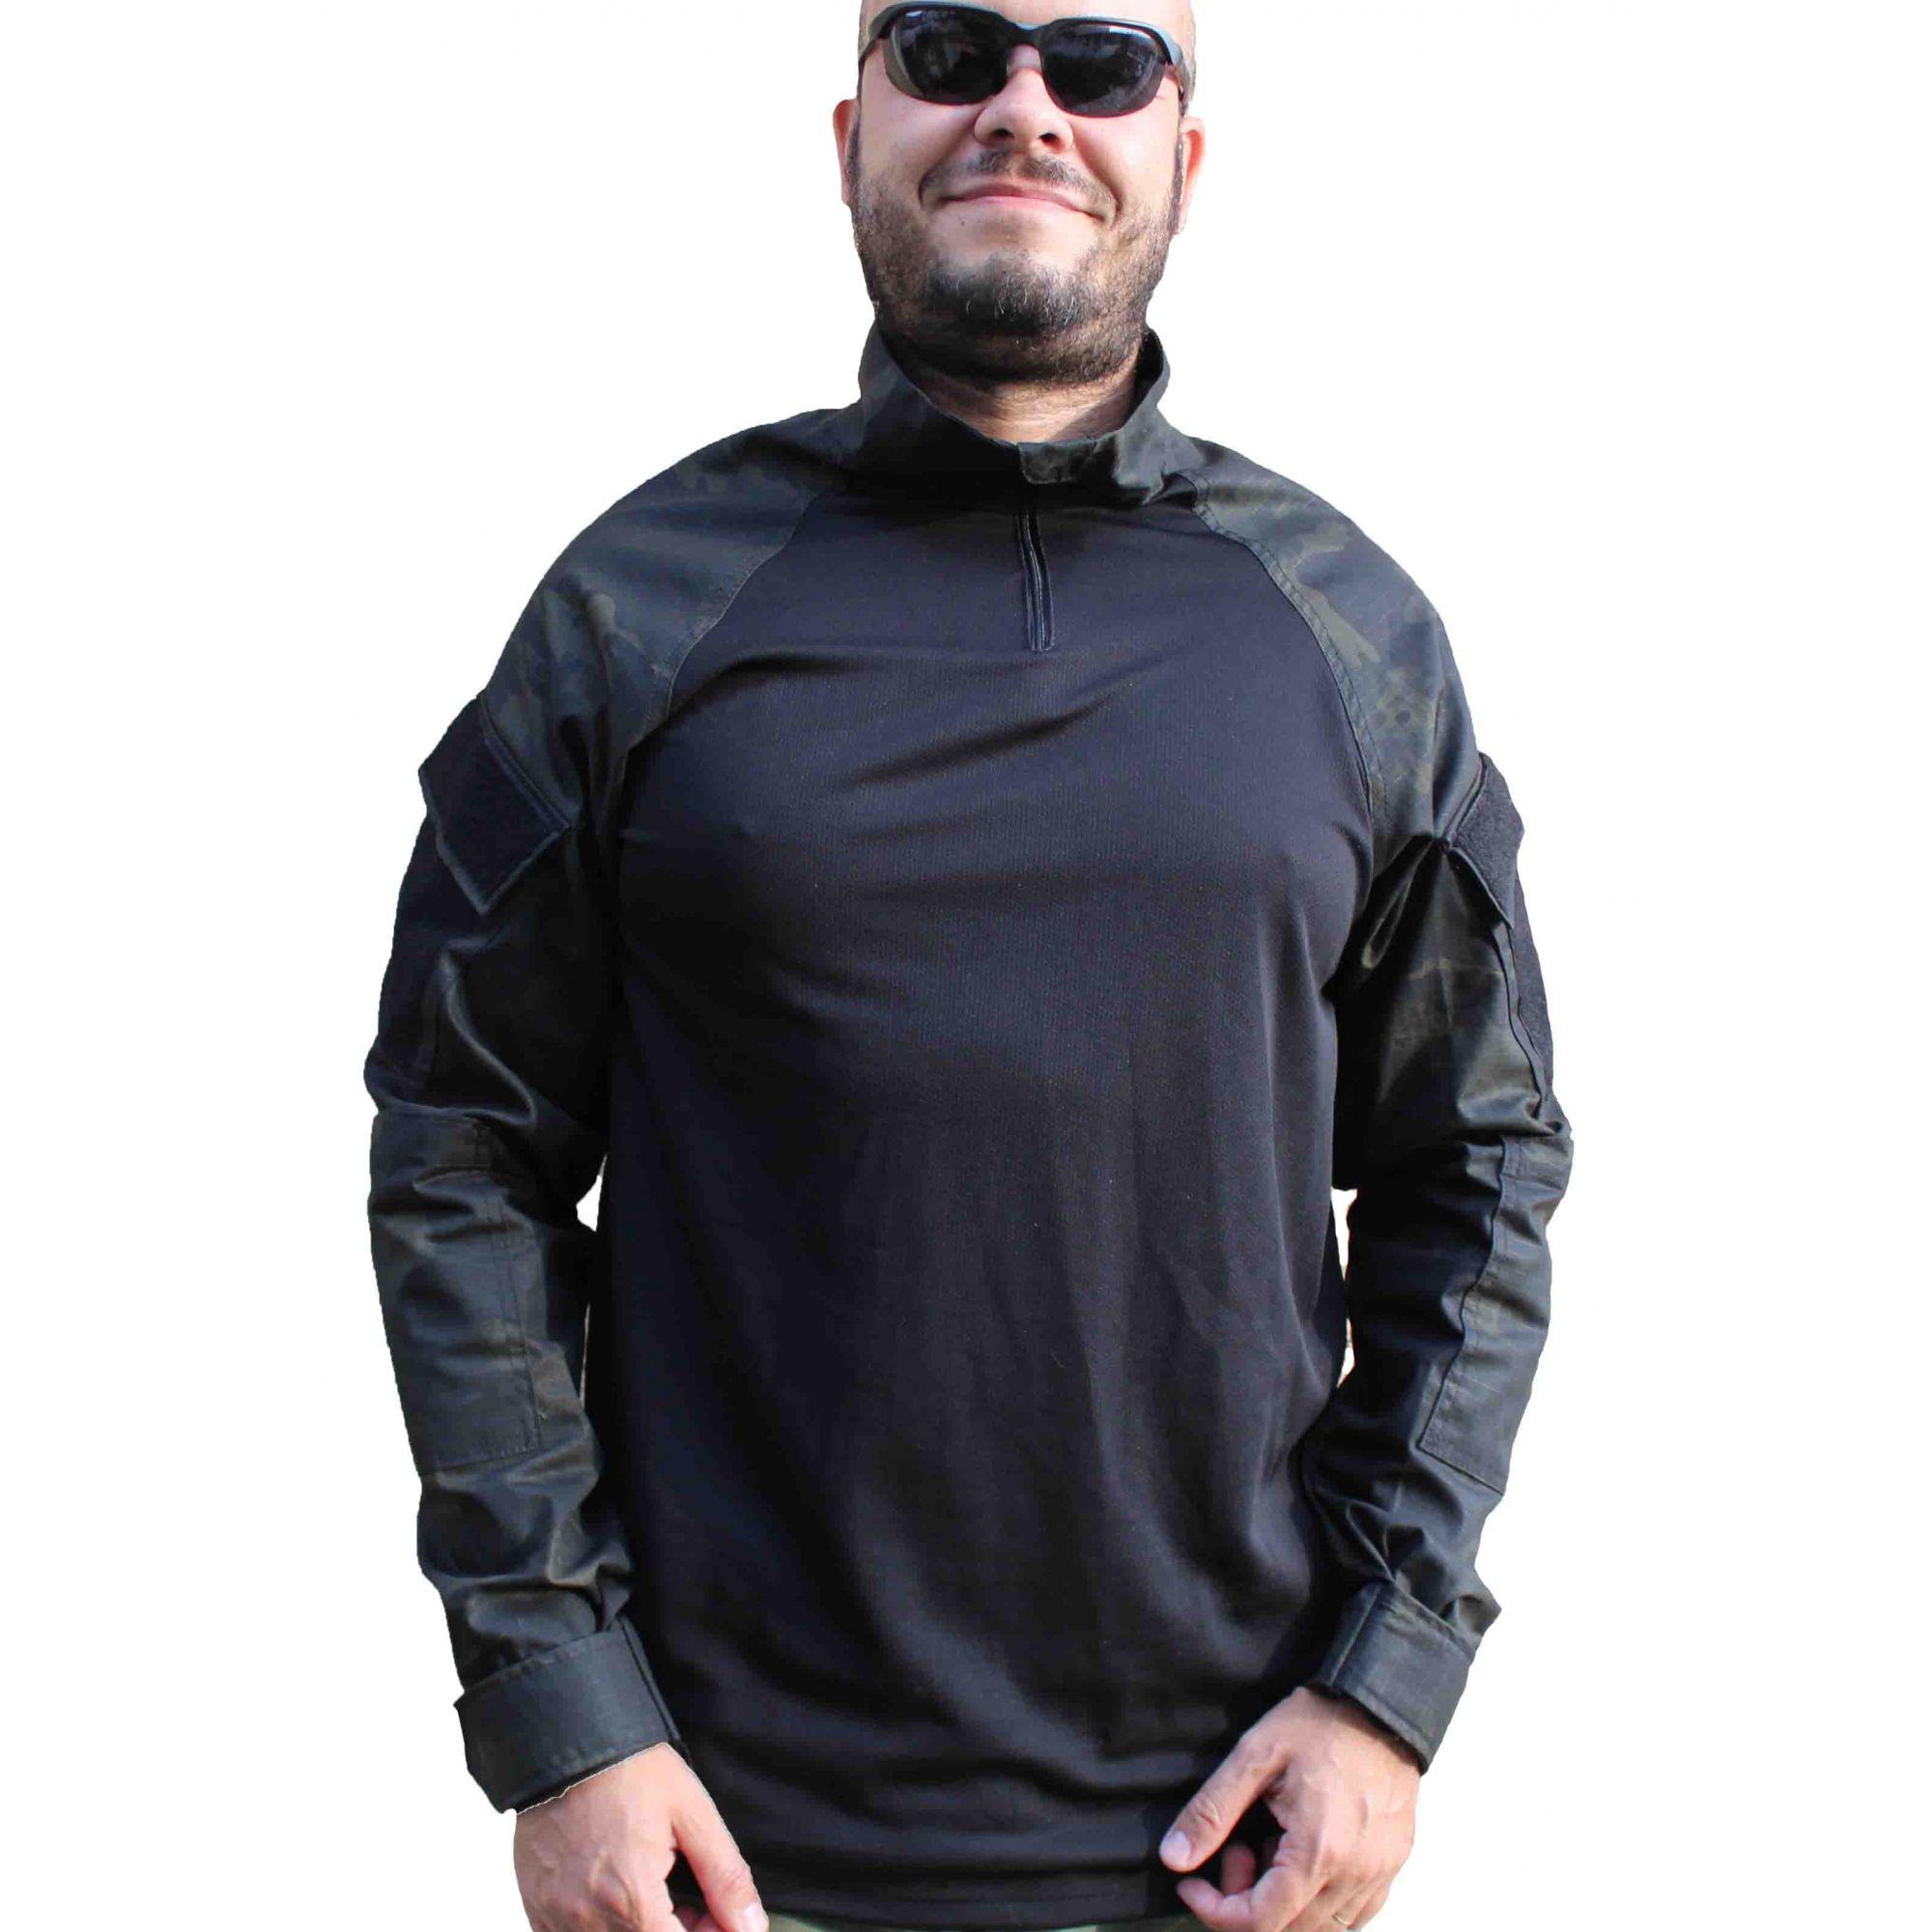 Combat Shirt Tatica - Multicam Black